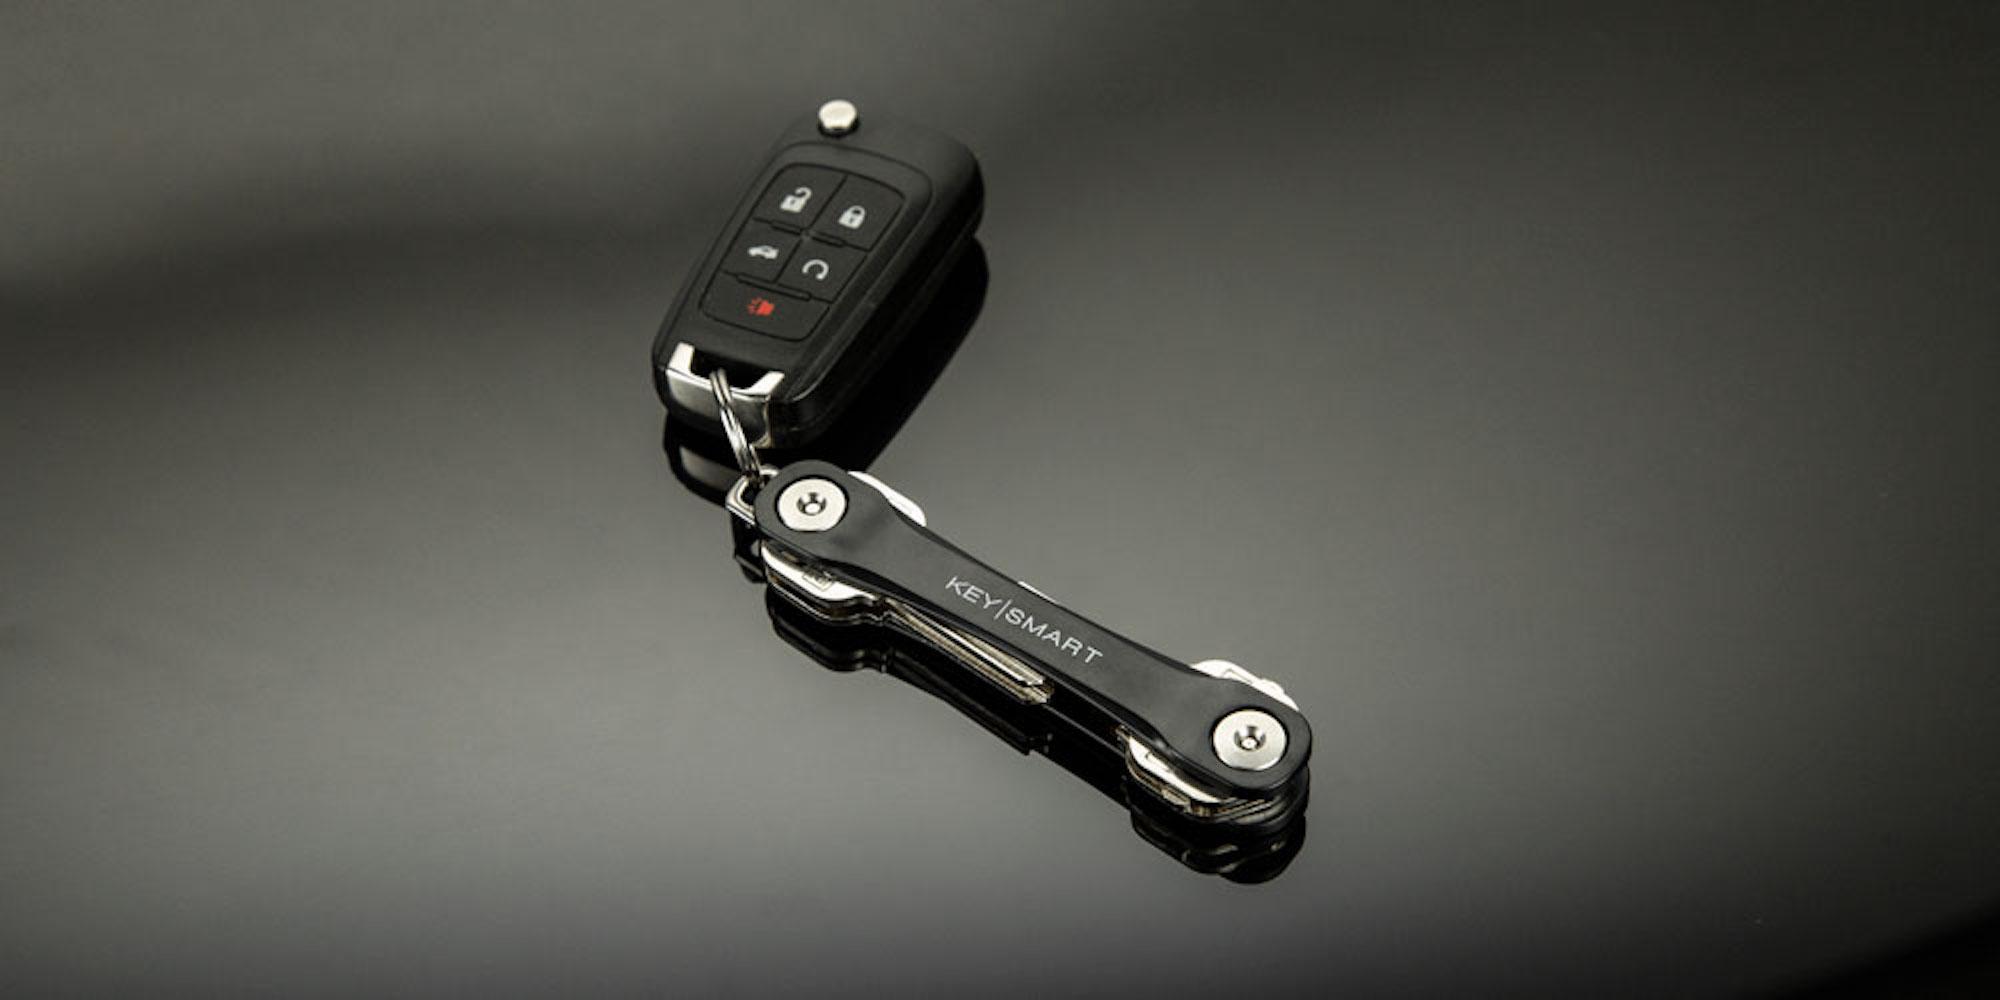 KeySmart Flex keeps your keys organized, 2-pack now $15 (Orig. $20)